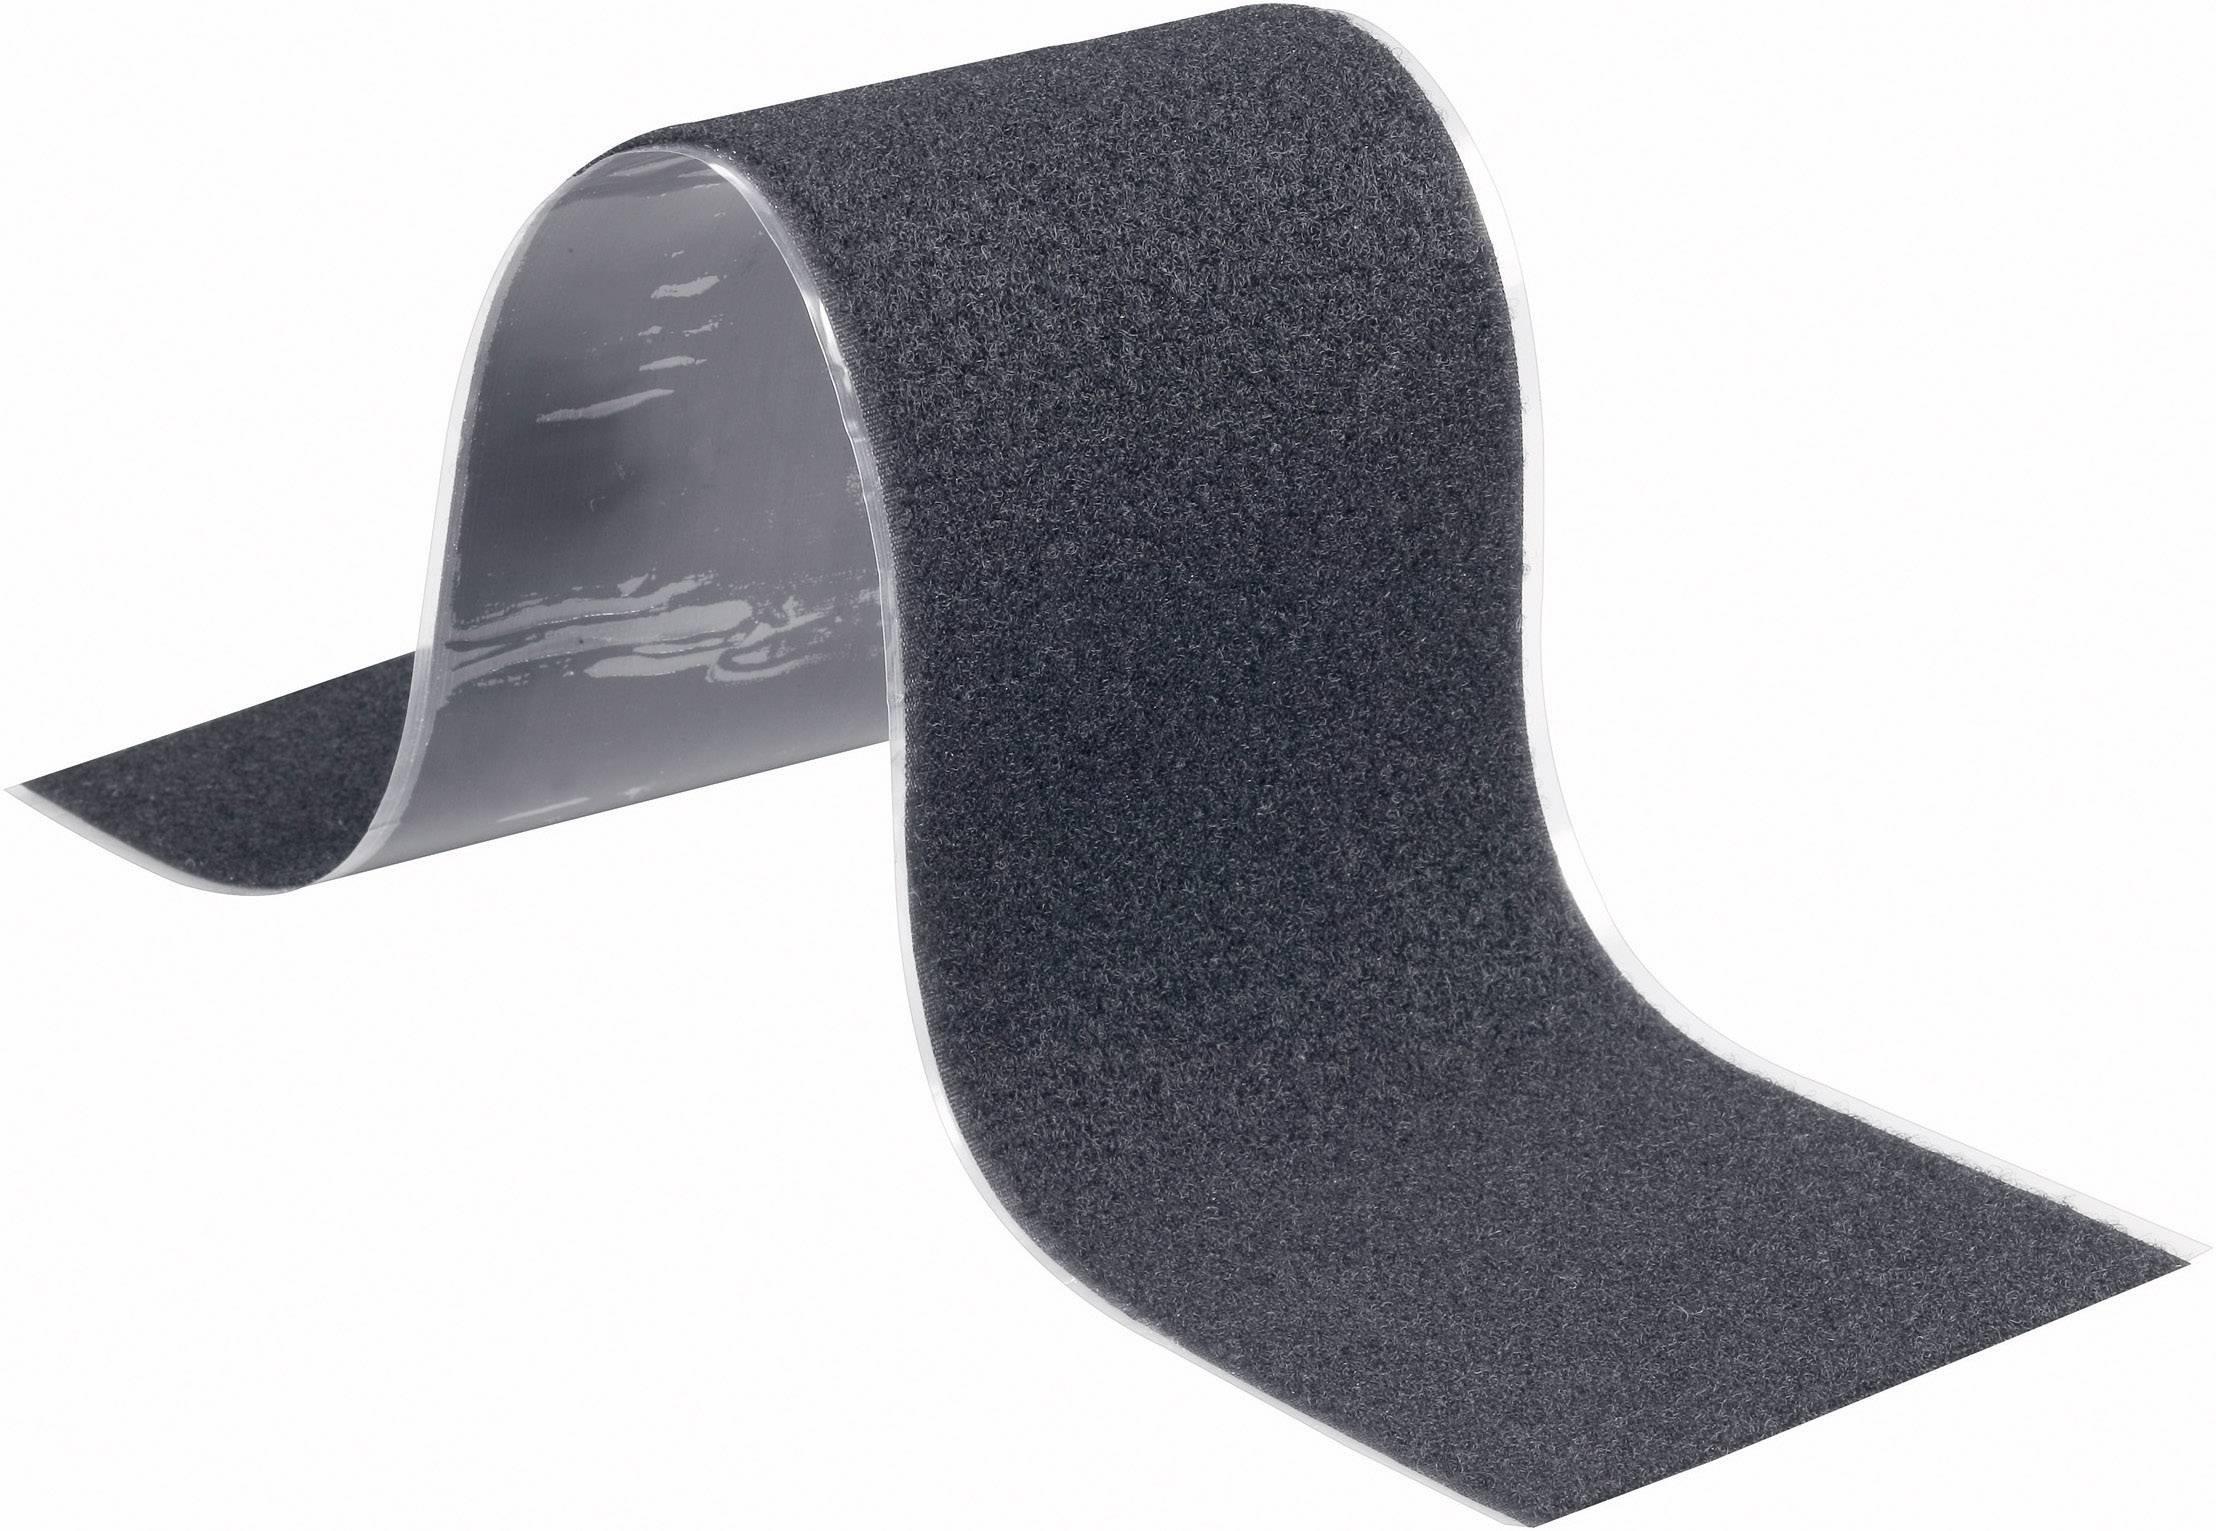 Lepiaci pásik so suchým zipsom Fastech T02-107-500, (d x š) 500 mm x 100 mm, čierna, 1 ks